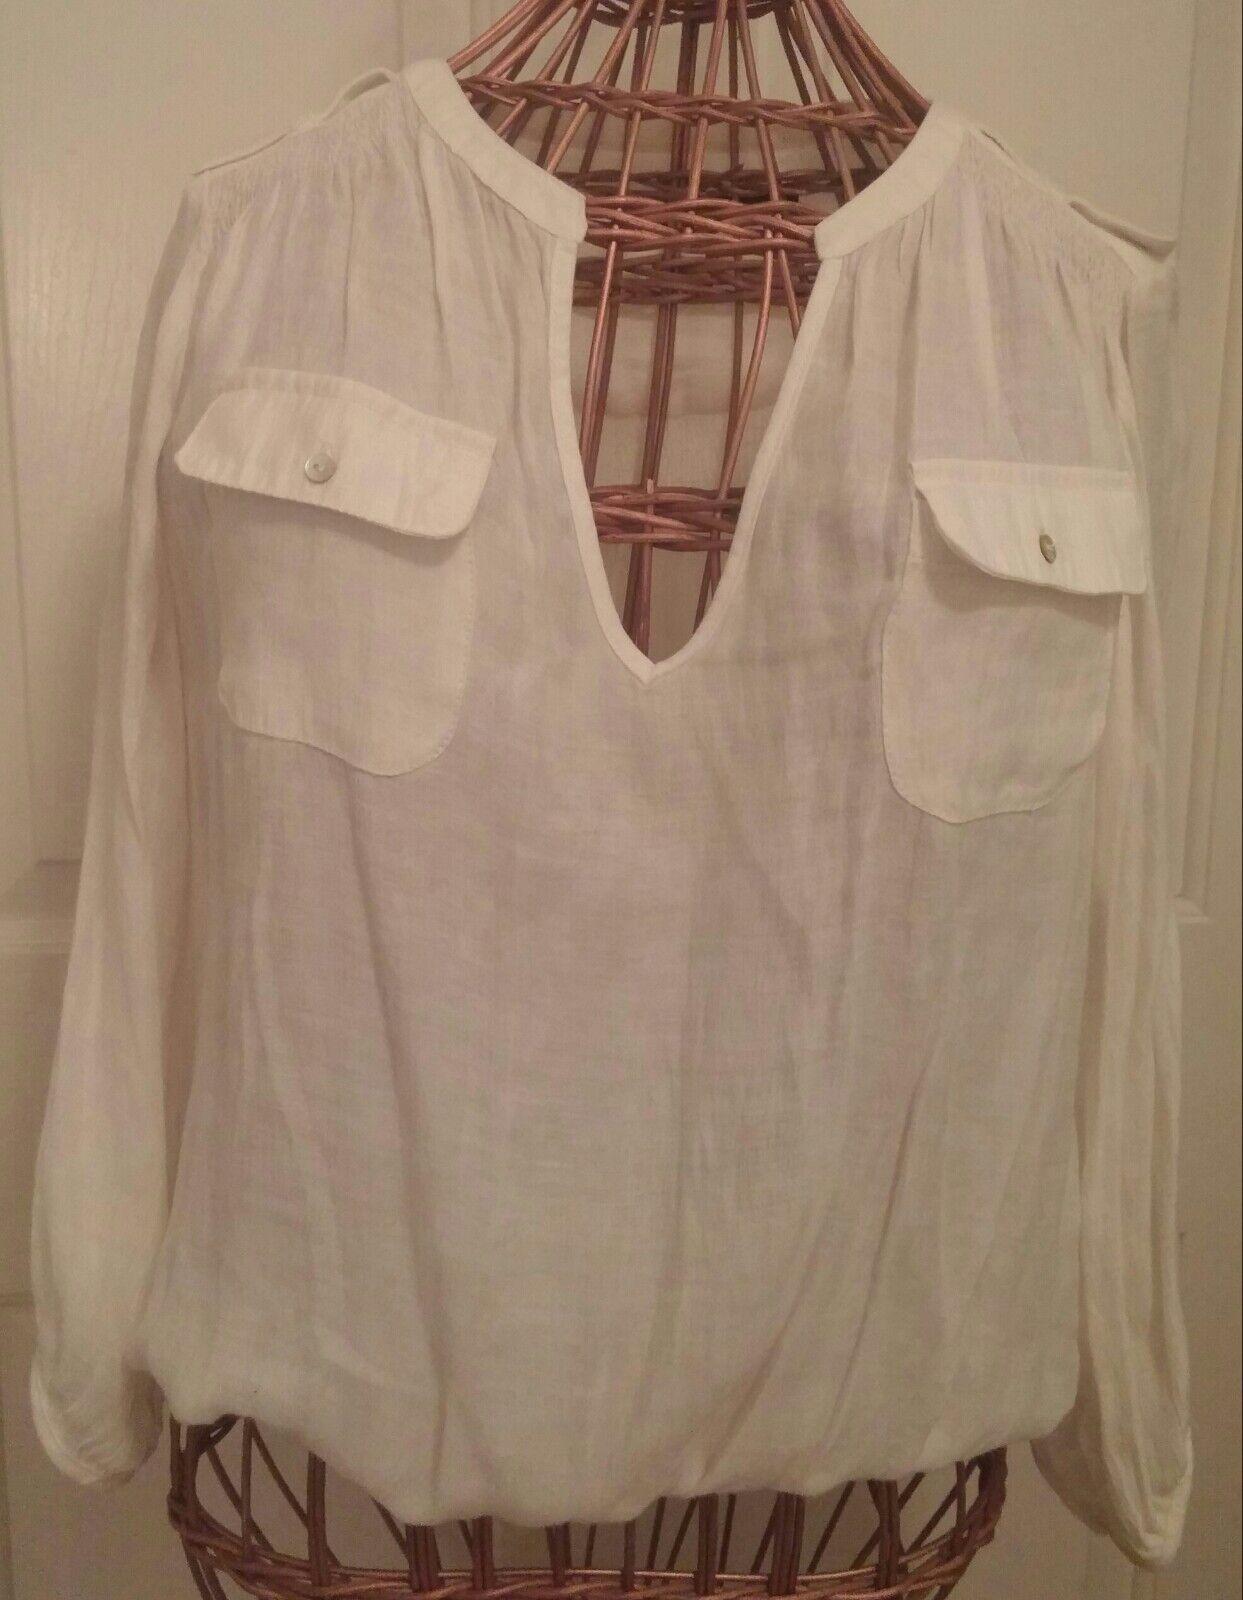 ZARA BASIC Women's Ivory Peasant Style Blouse Top Sz. Large